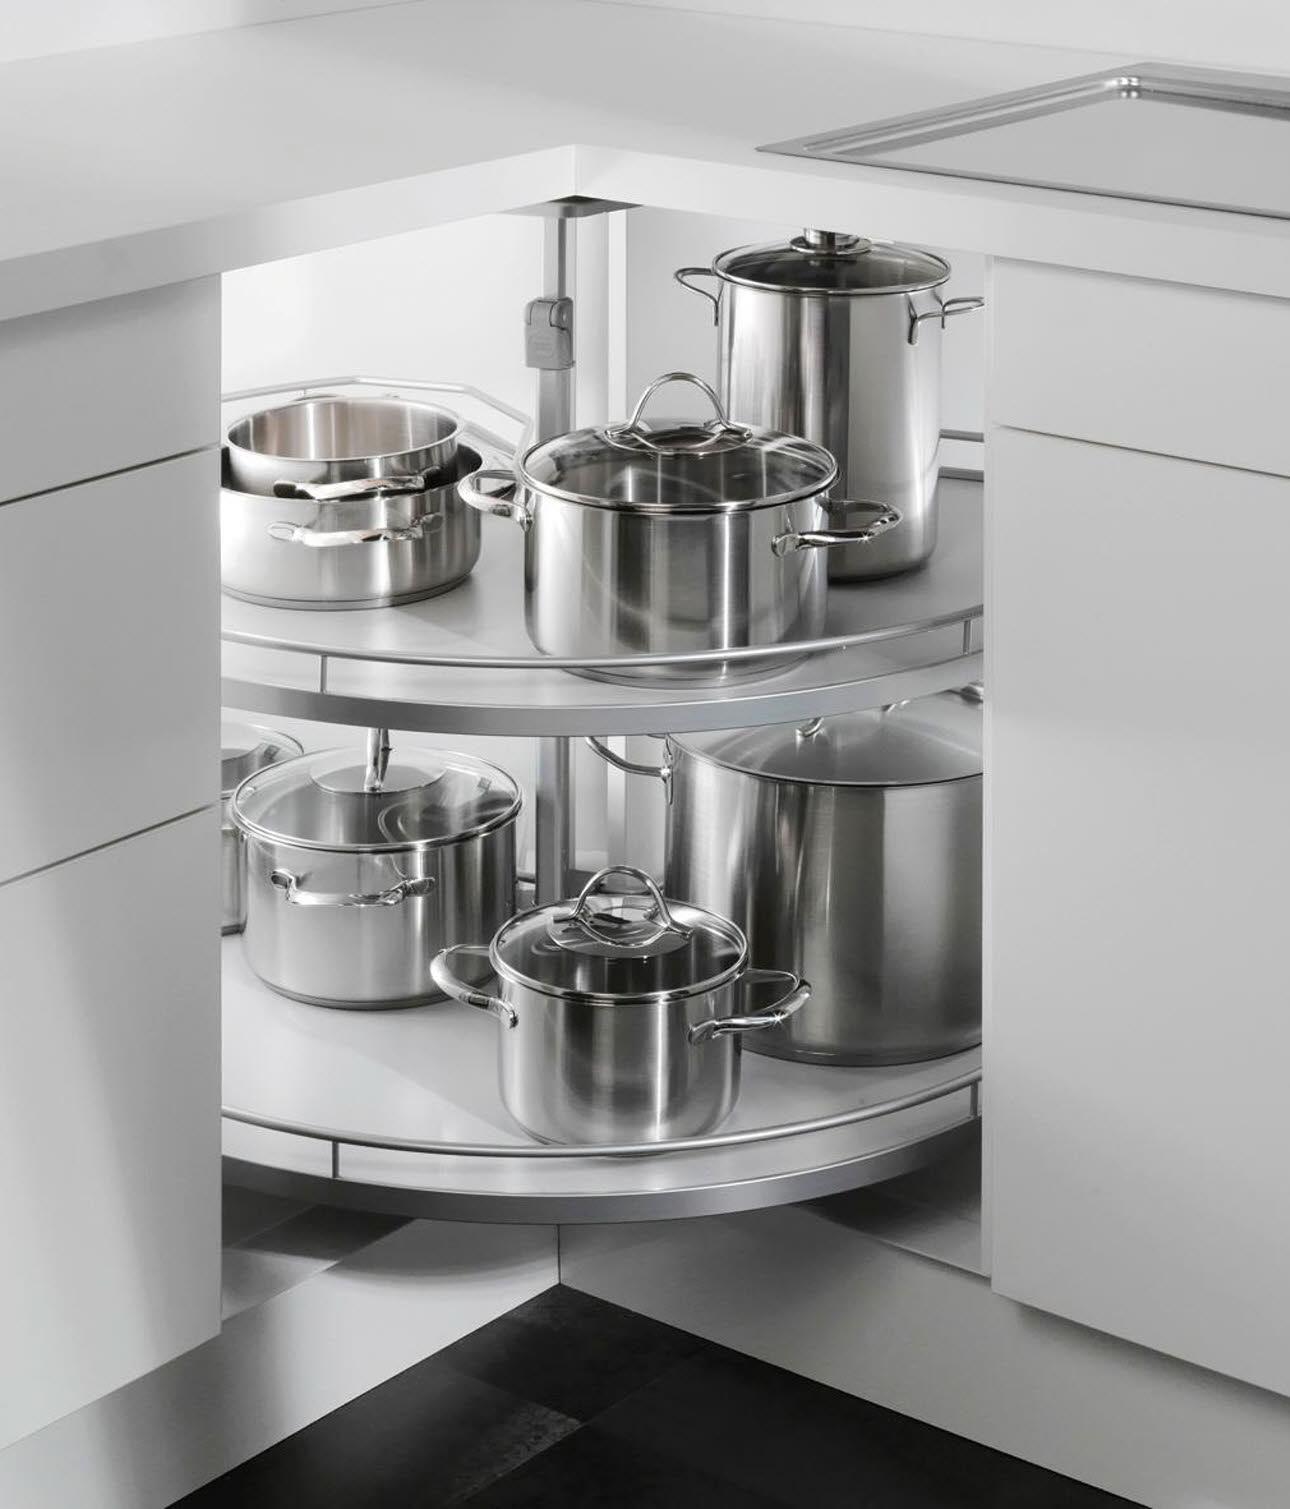 Kuchen Eckschrank Rondell Ersatzteile – Caseconrad.com